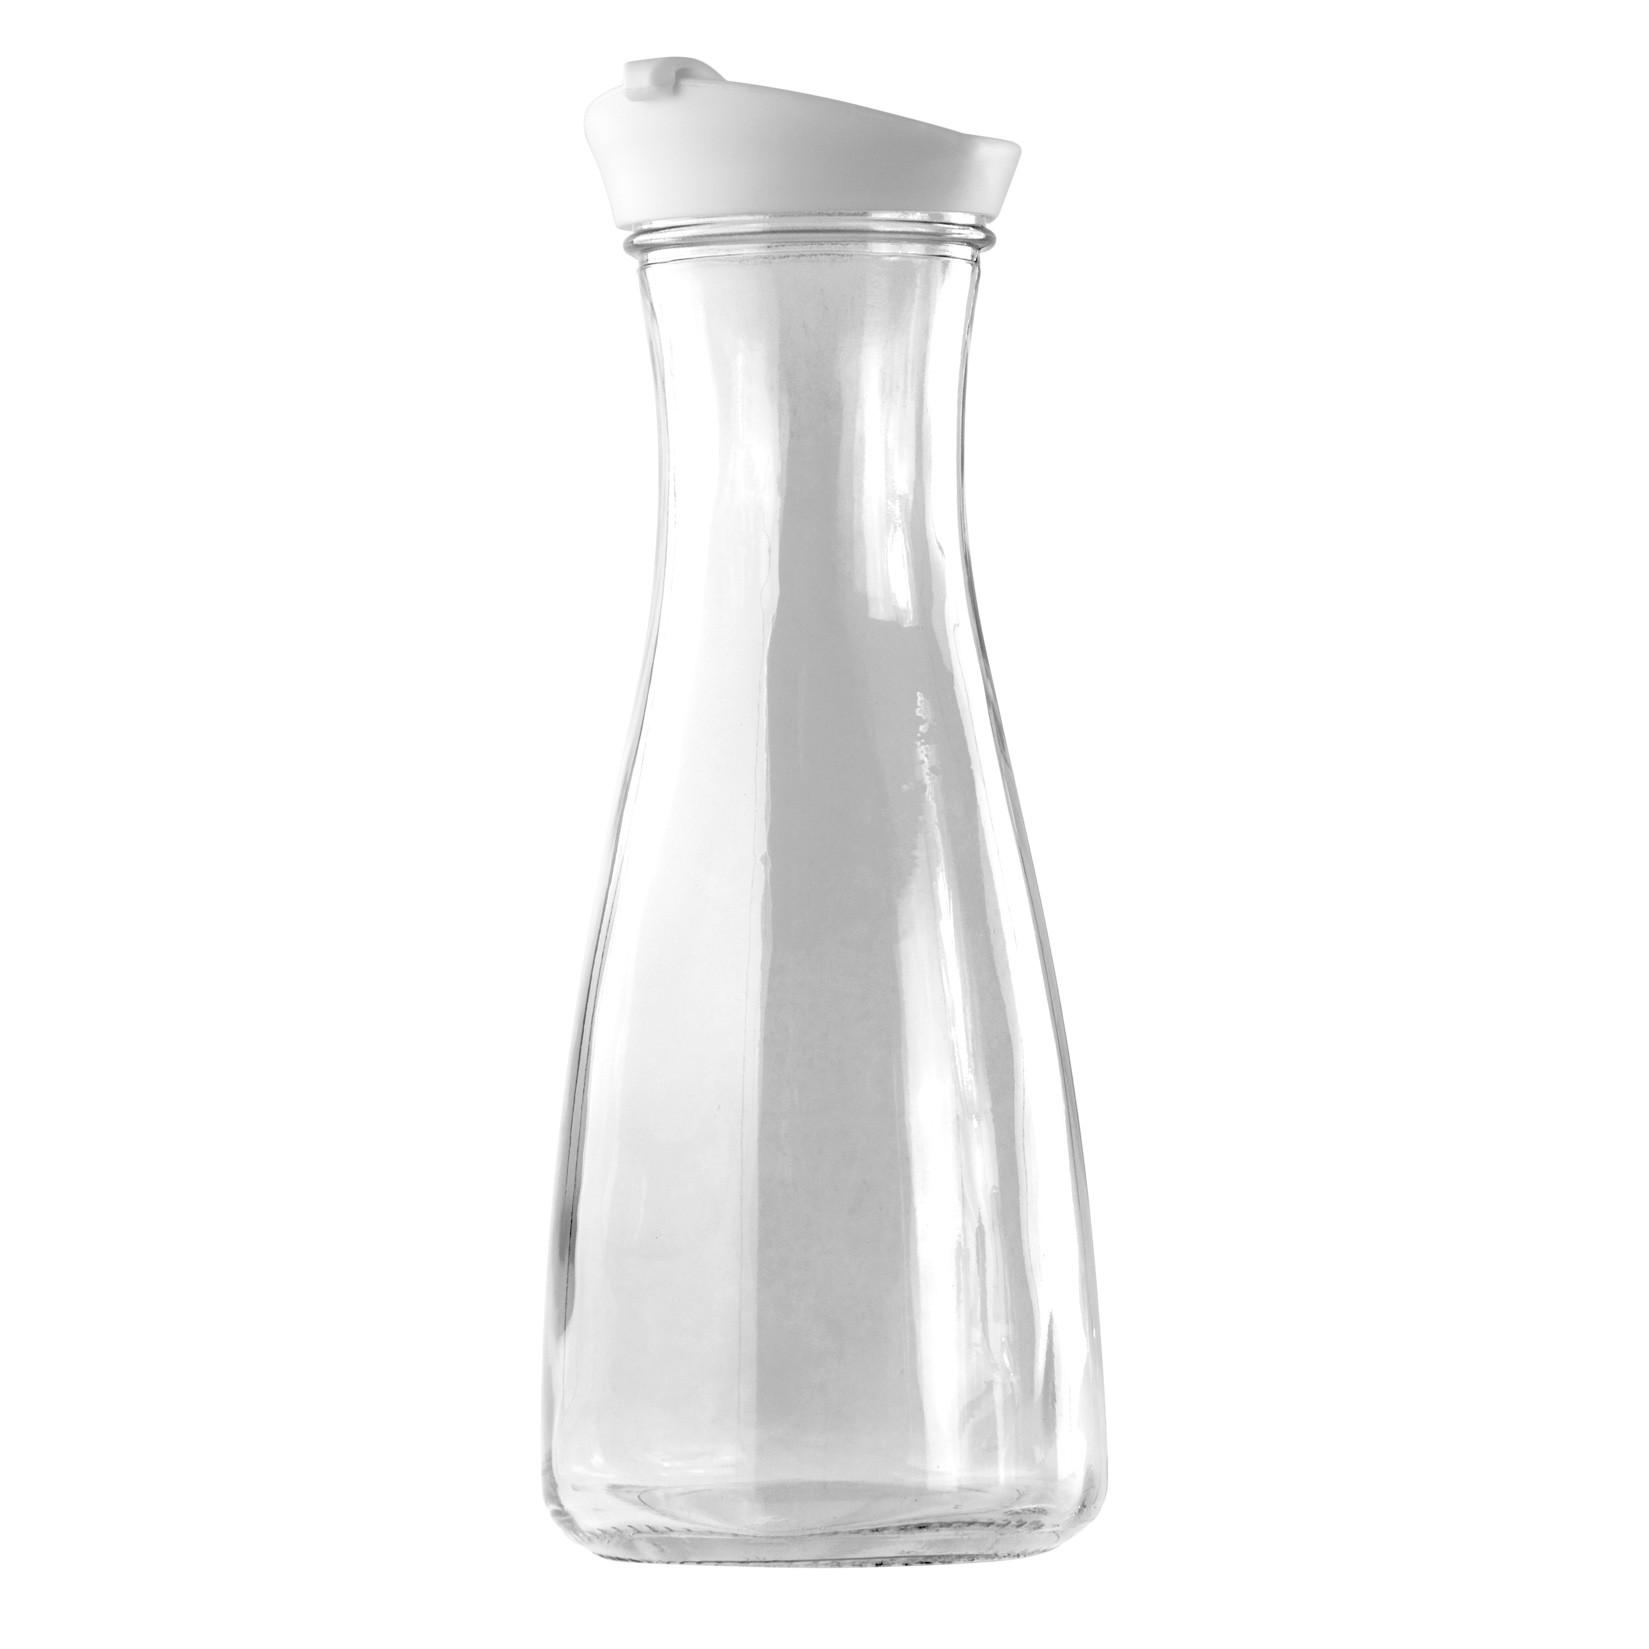 Garrafa de Vidro Transparente 10L - Bianchini